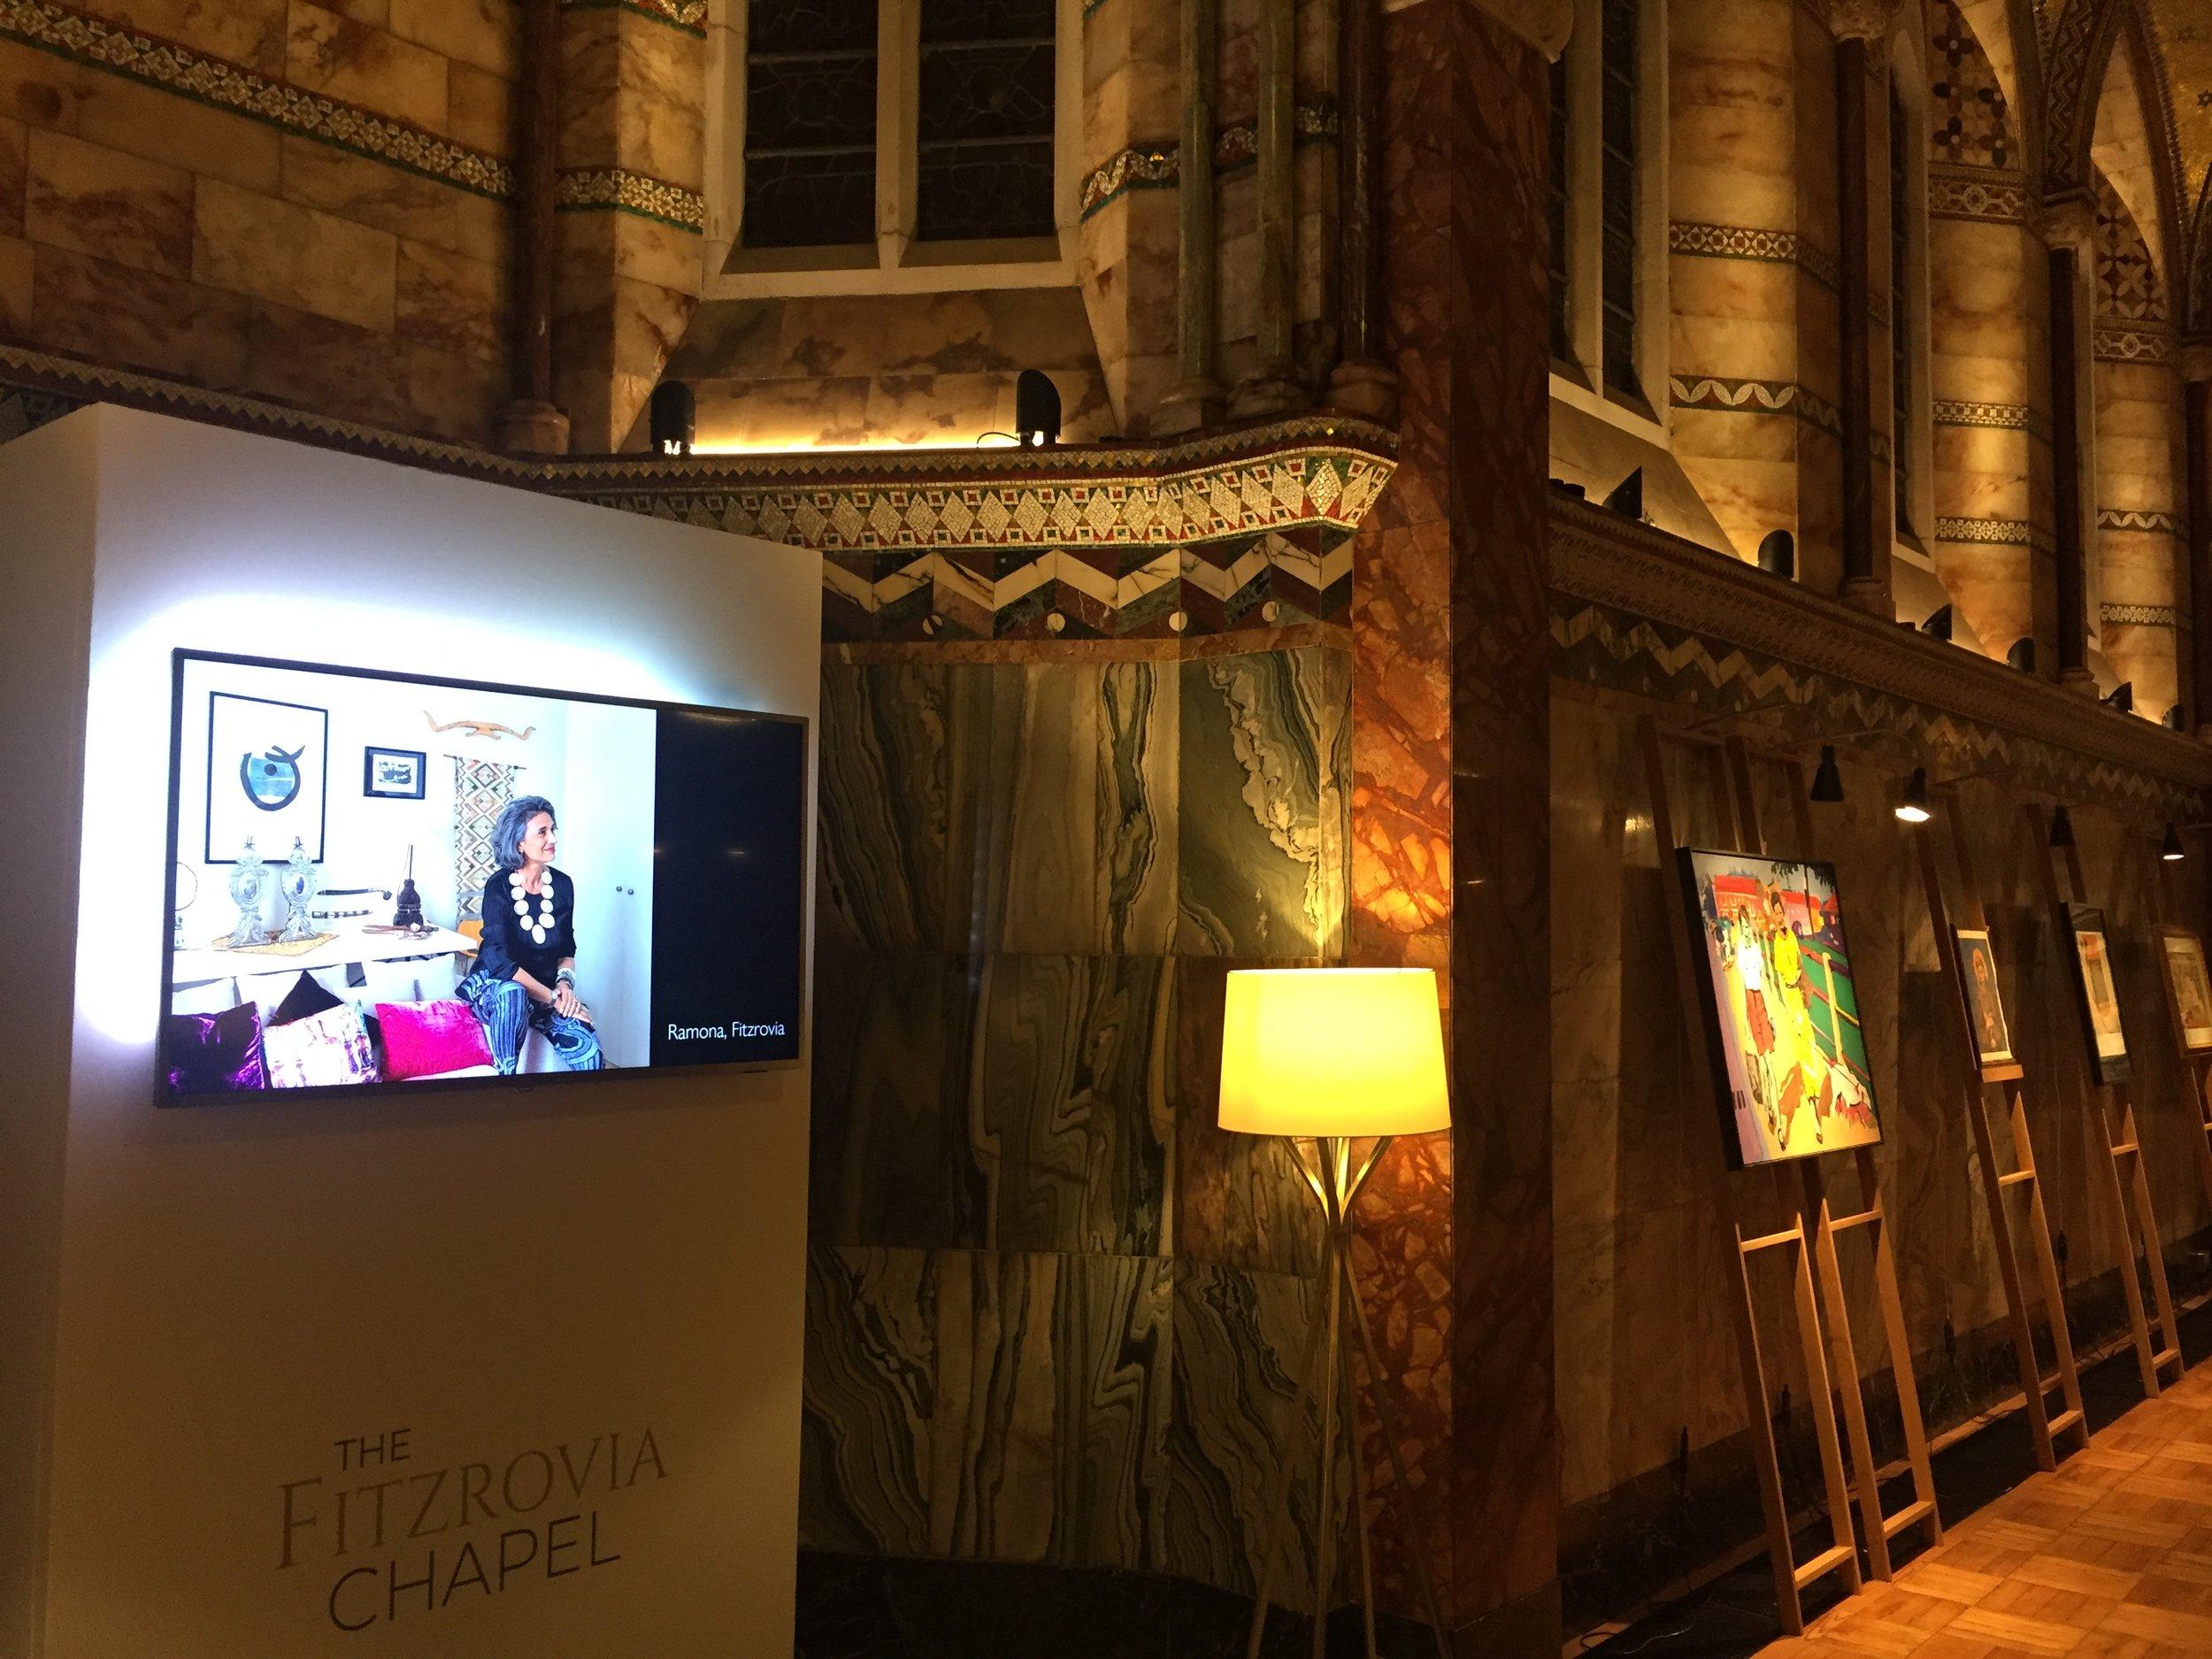 Dwelling Exhibition at Fitzrovia Chapel, London W1 Nov2018